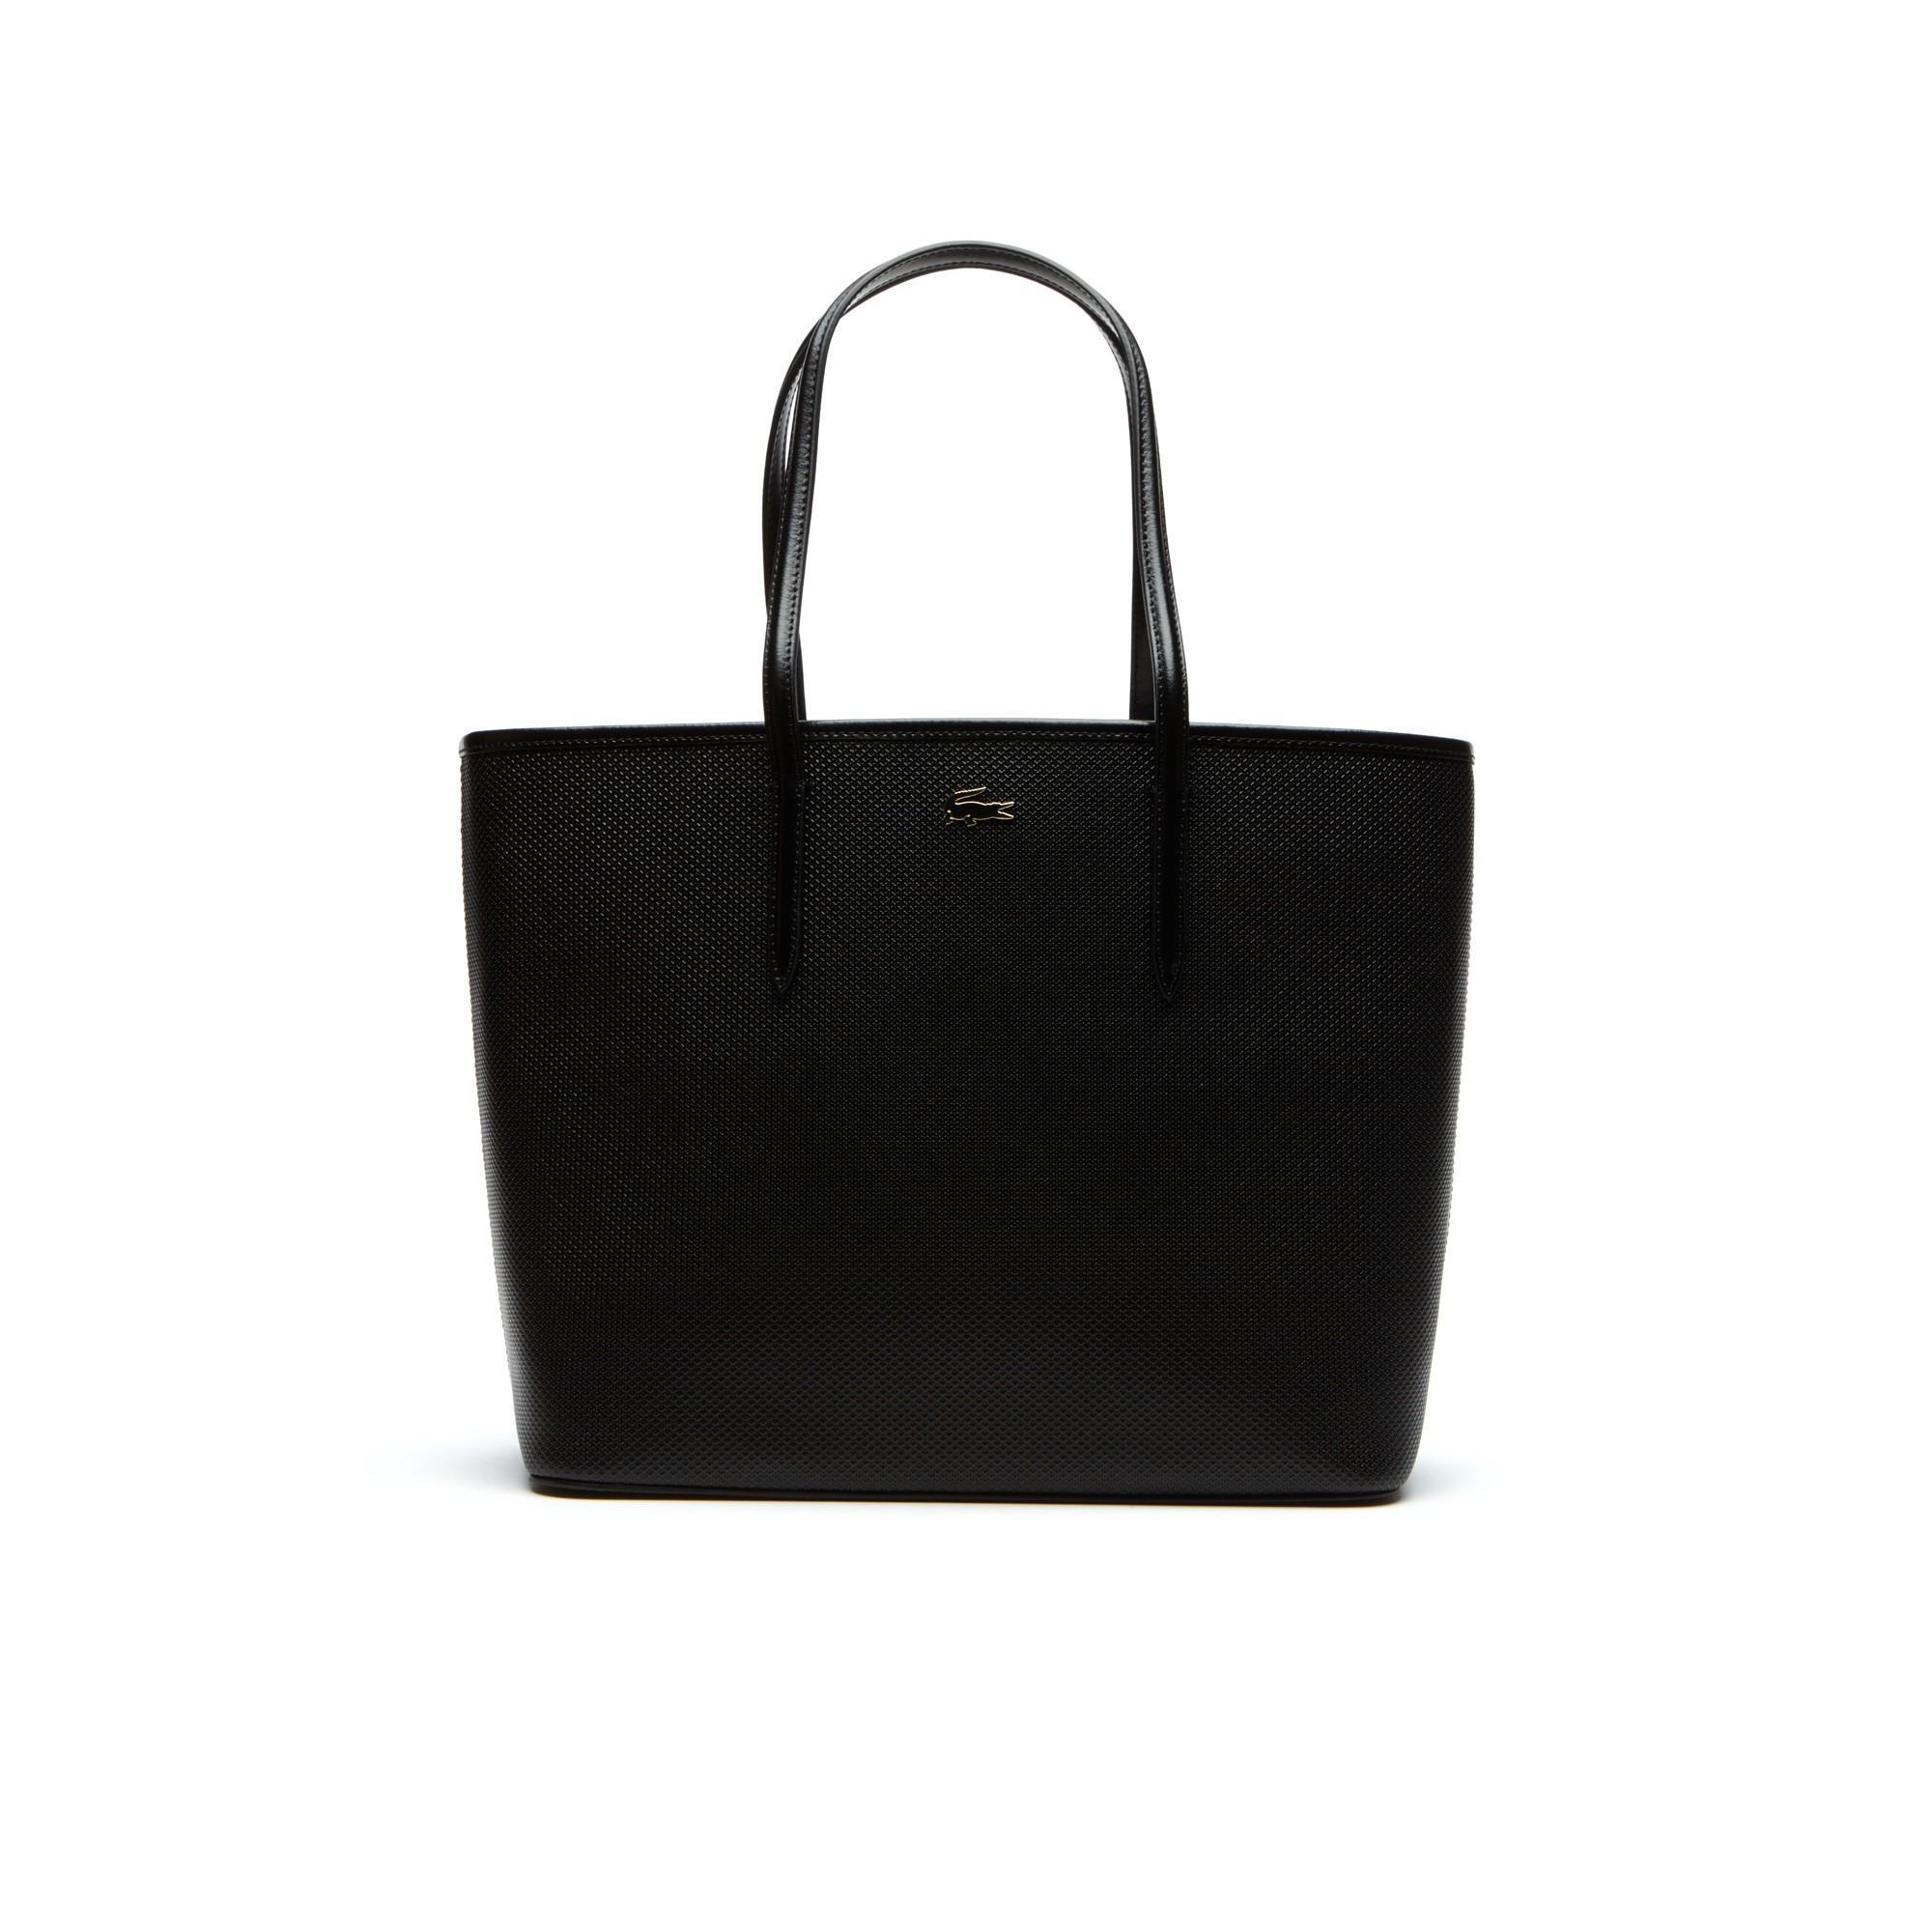 Lacoste Women's Chantaco Piqué Leather Tote Bag In Black